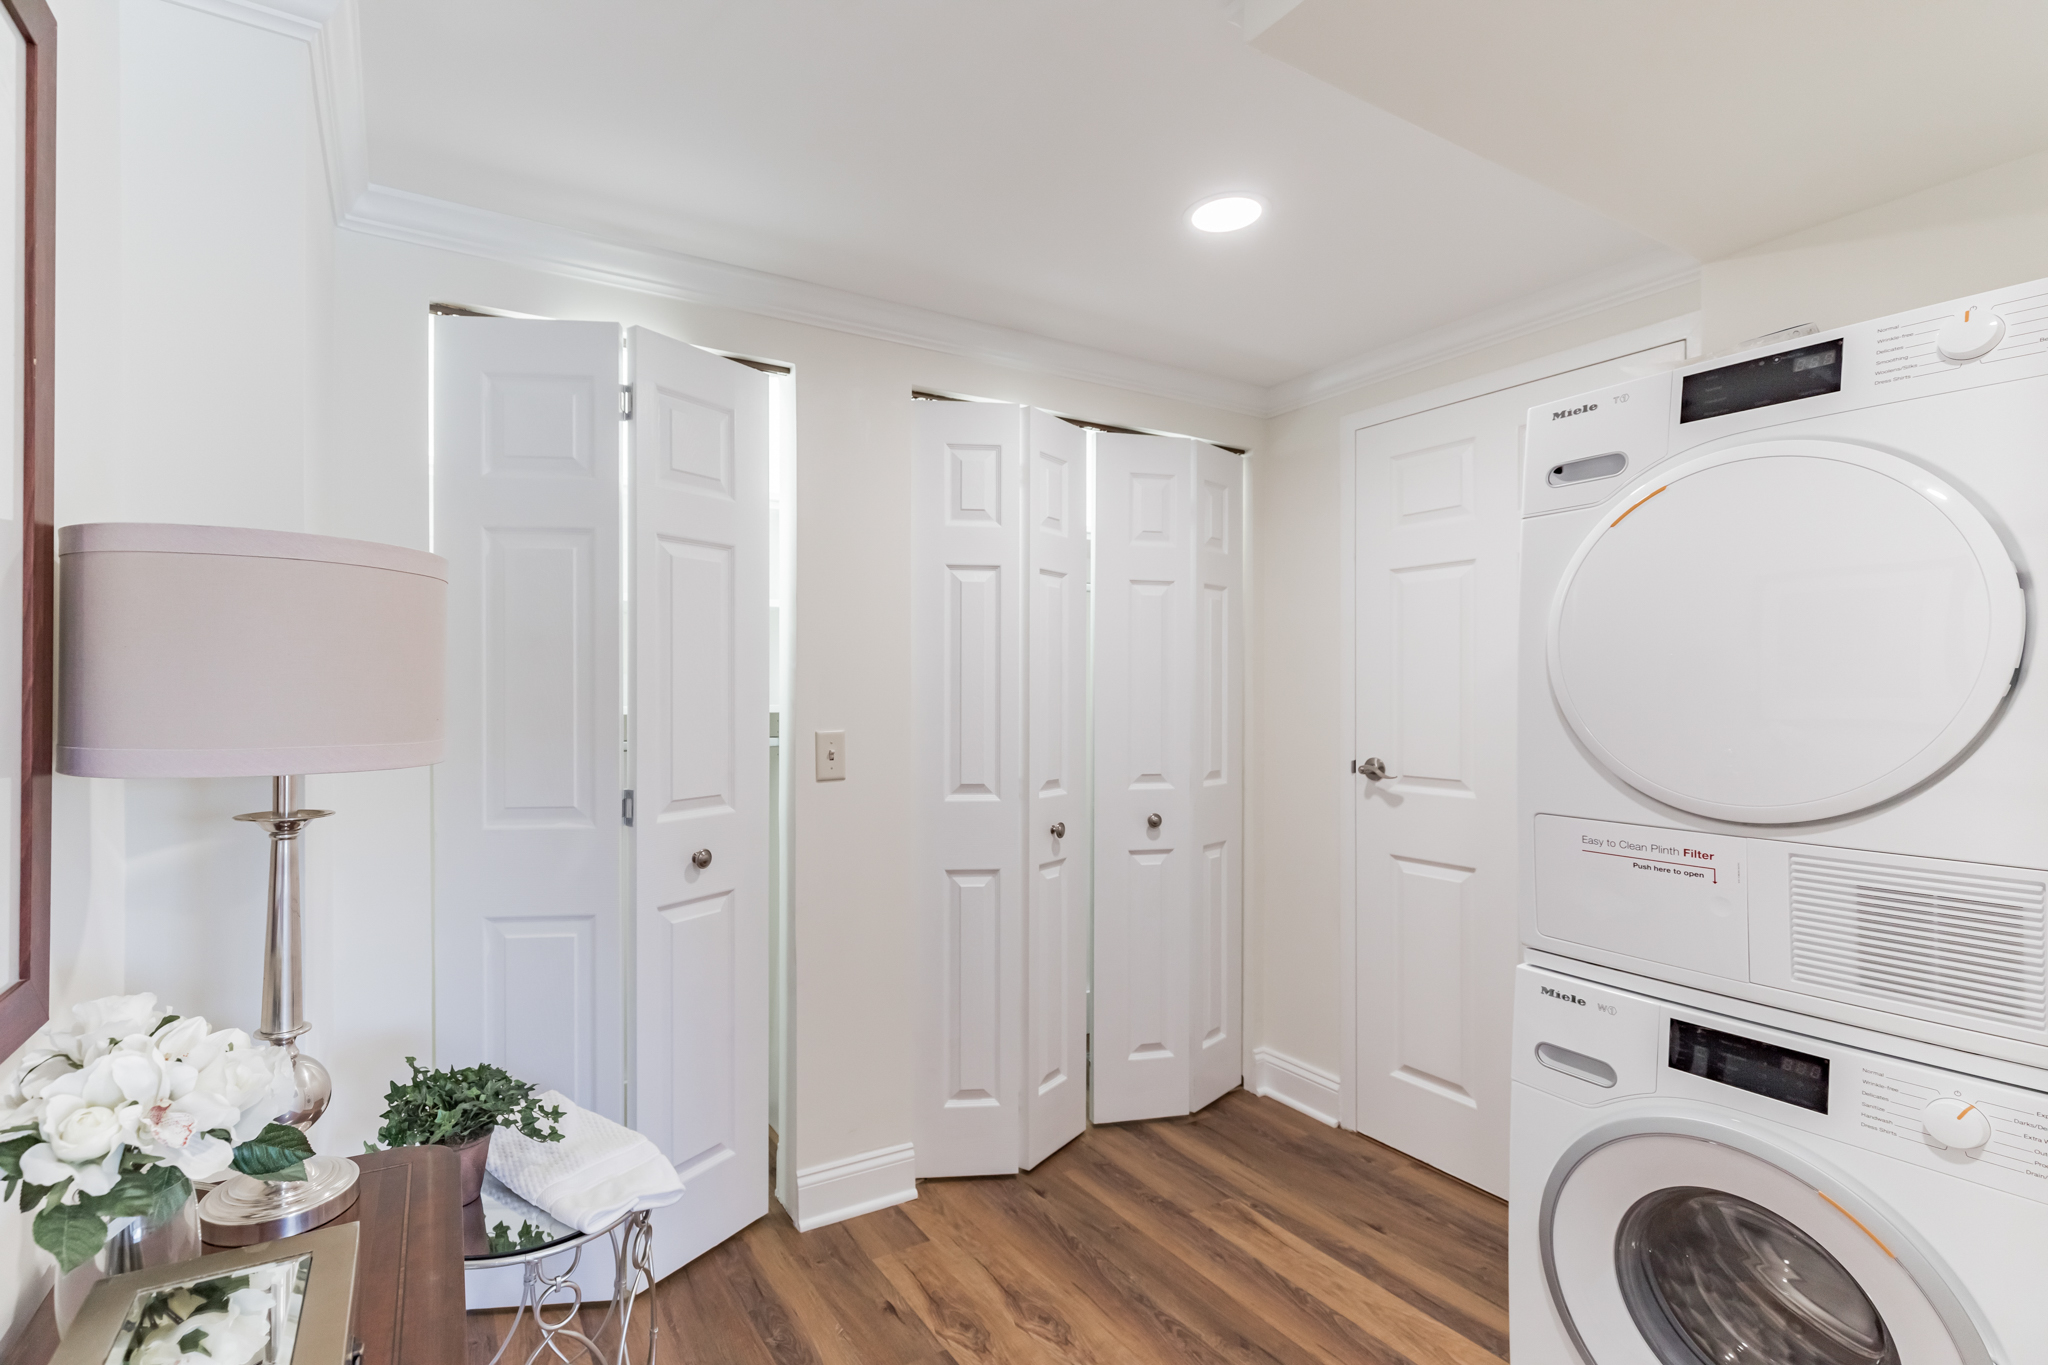 The Cheswick Series laundry